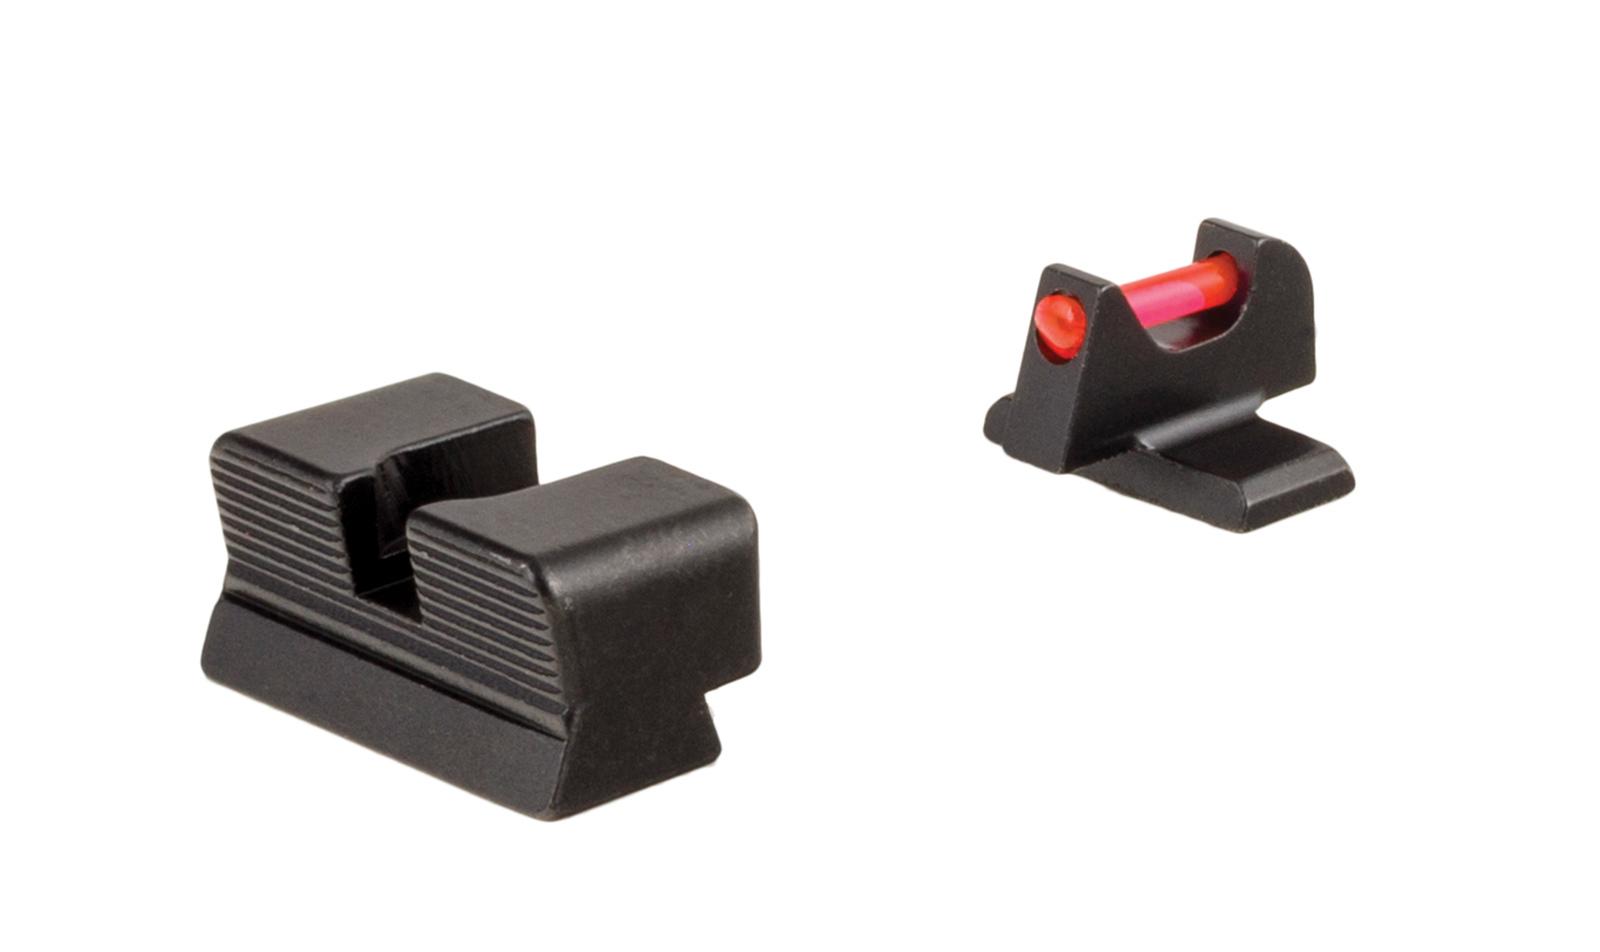 Trijicon™ Fiber Sights - Springfield XD, XD-M and XD Mod. 2